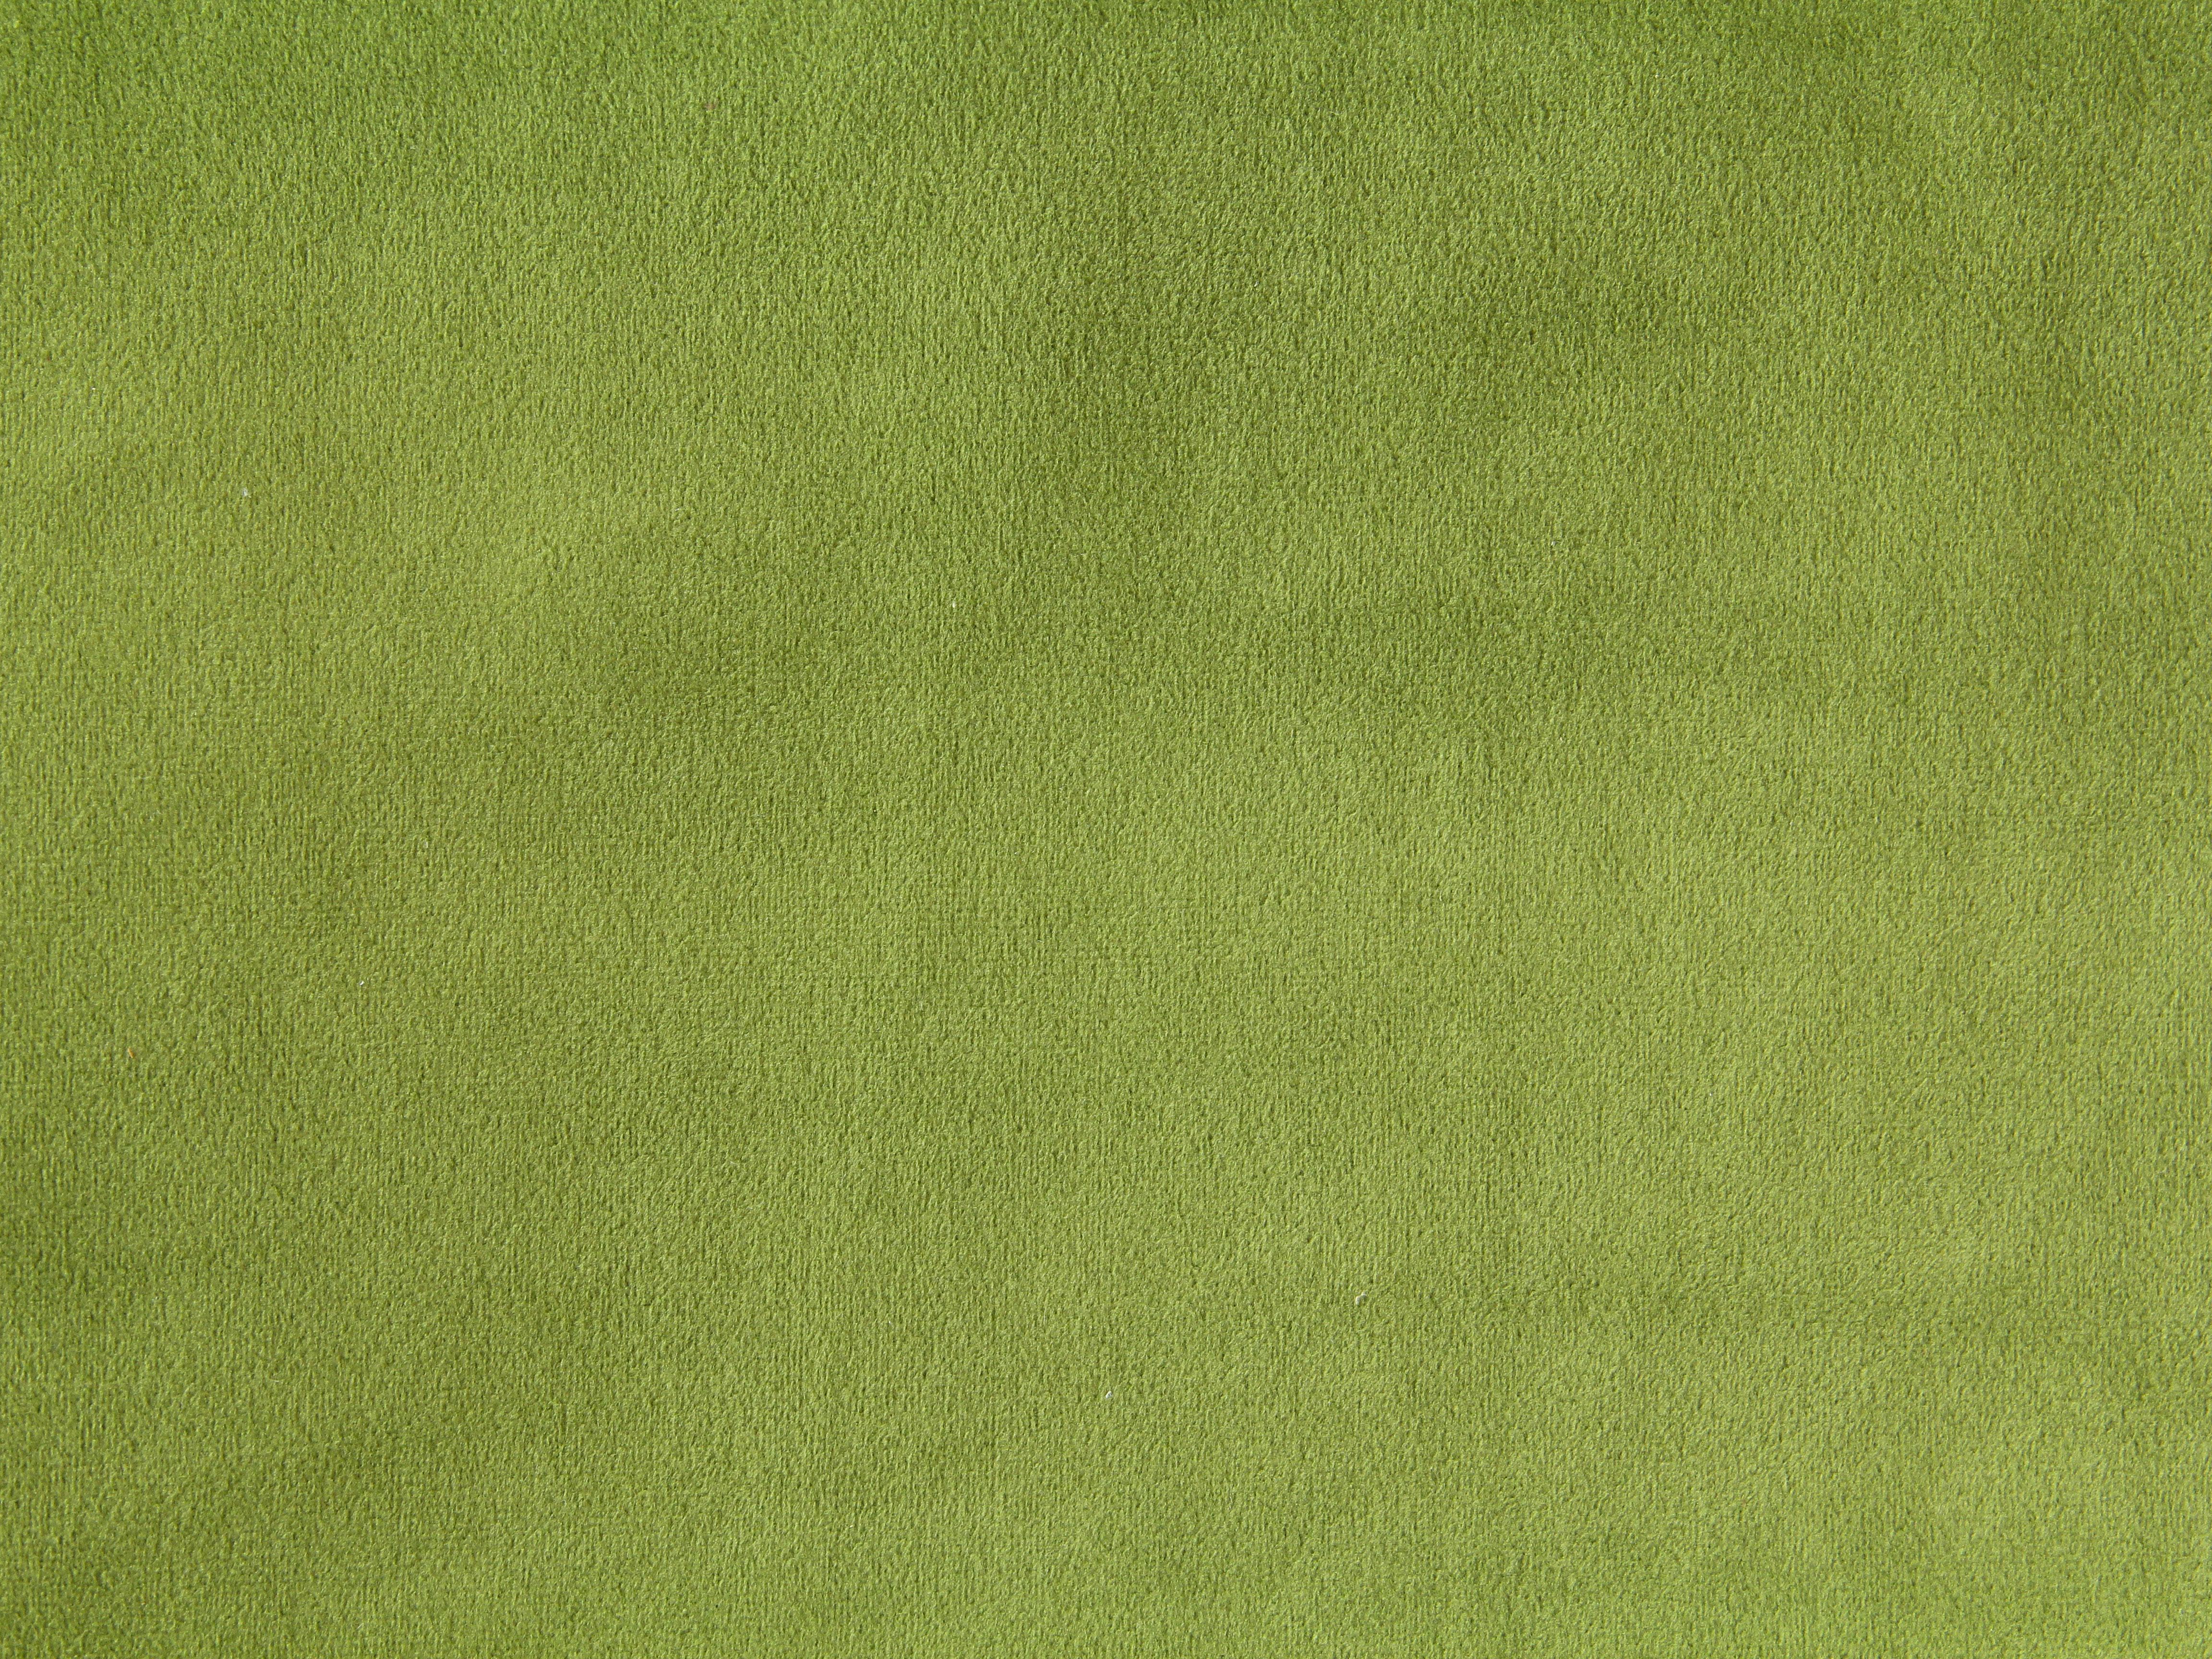 Free Photo Green Fabric Texture Wallpaper Satin